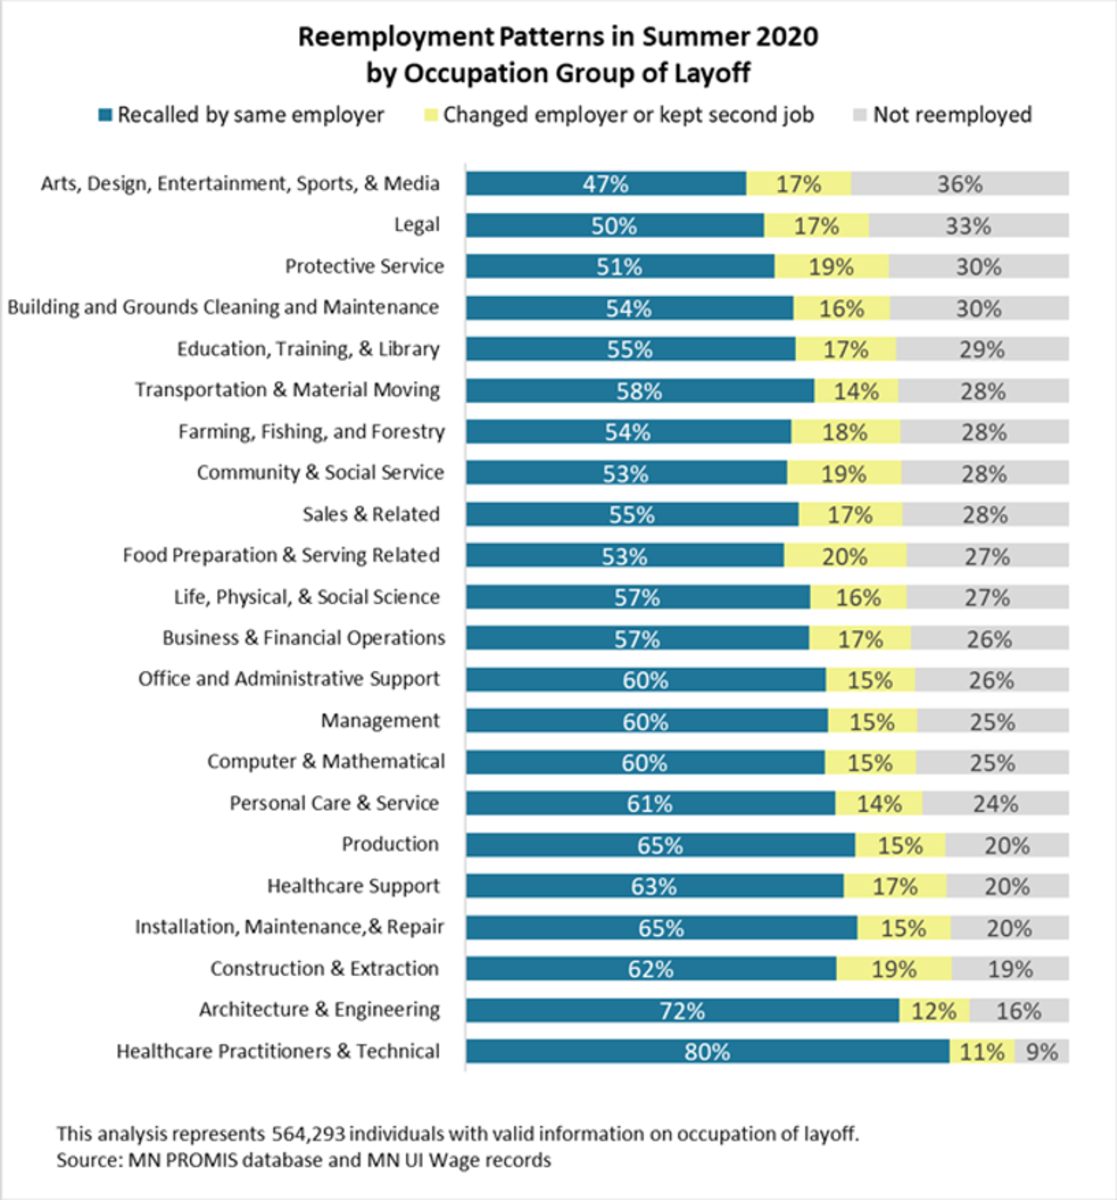 DEED - occupation reemployment